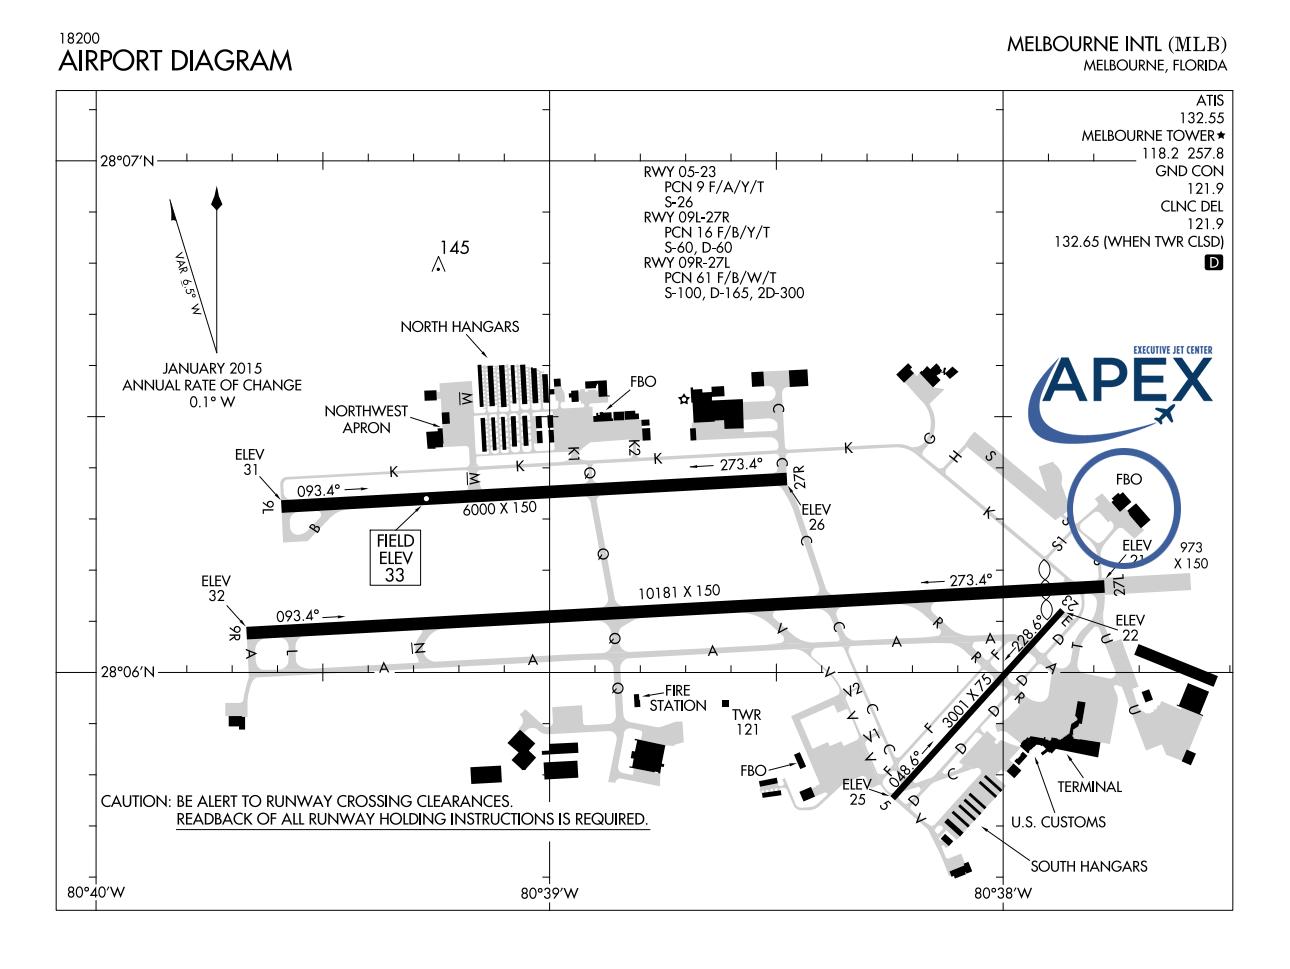 Melbourne International Airport Diagram